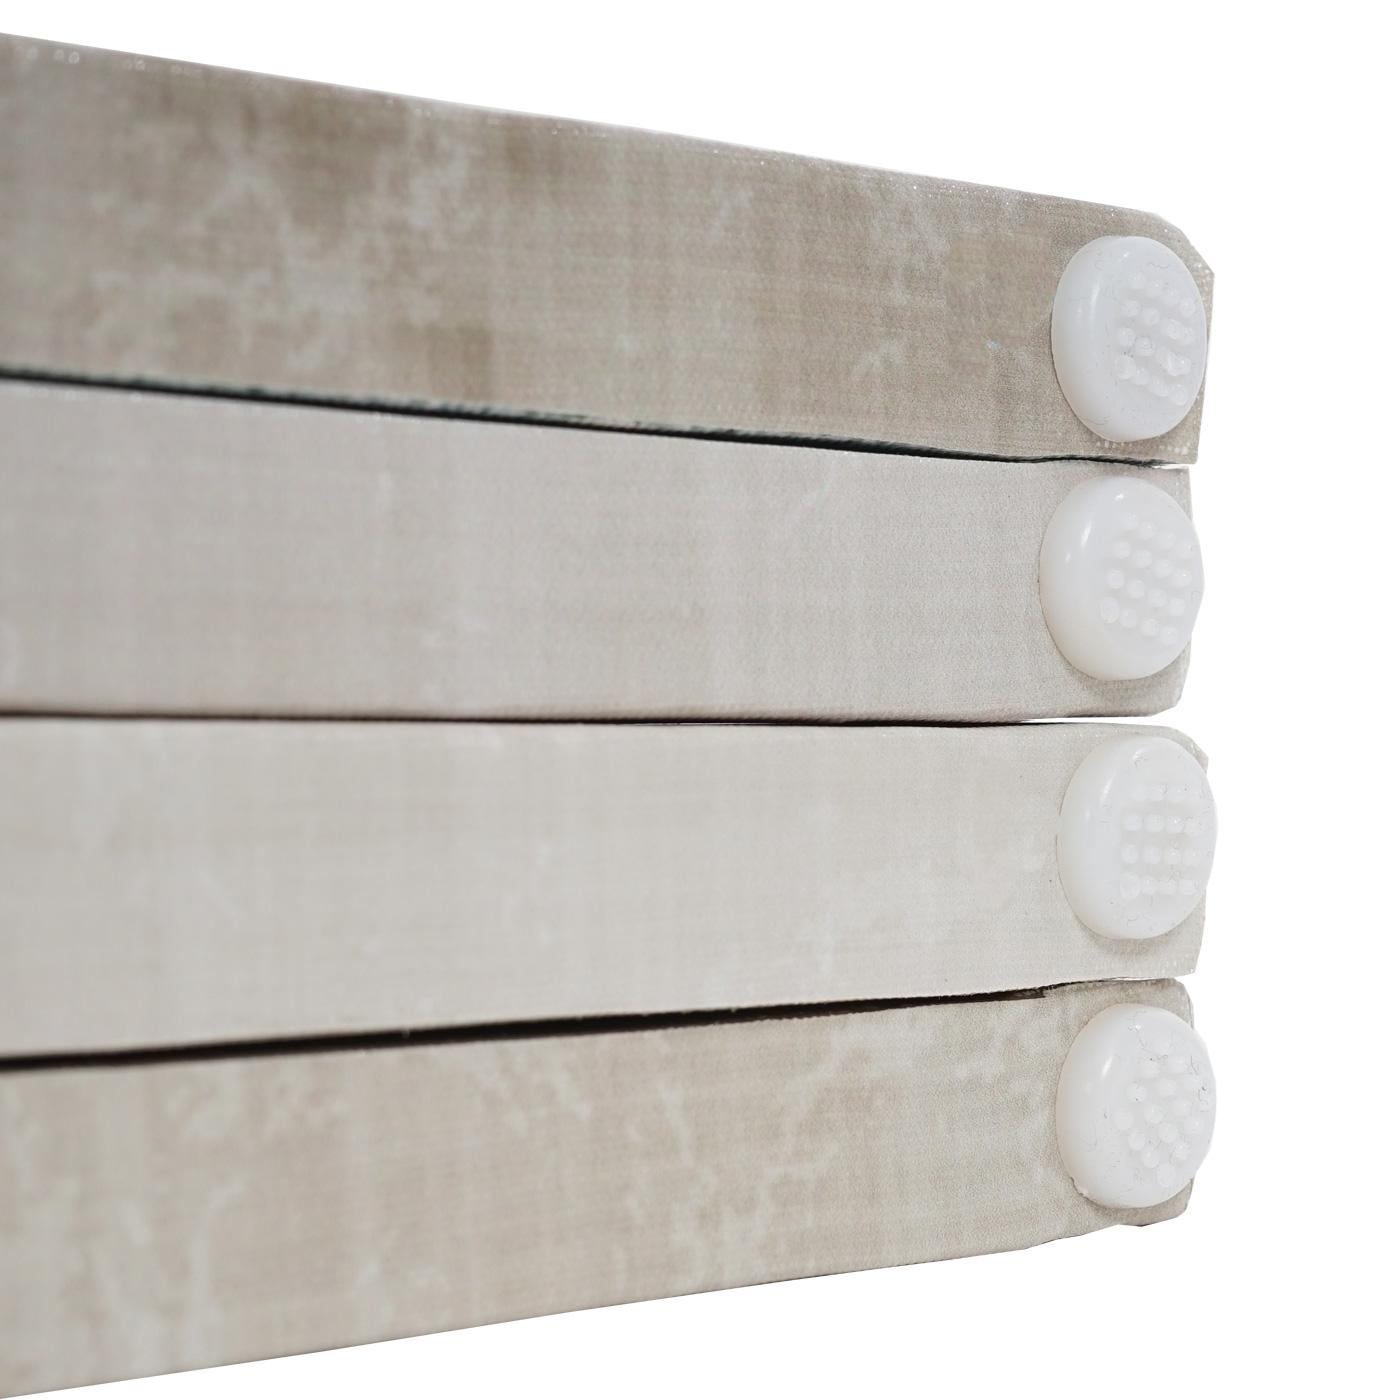 foto paravent bagheria raumteiler spanische wand. Black Bedroom Furniture Sets. Home Design Ideas